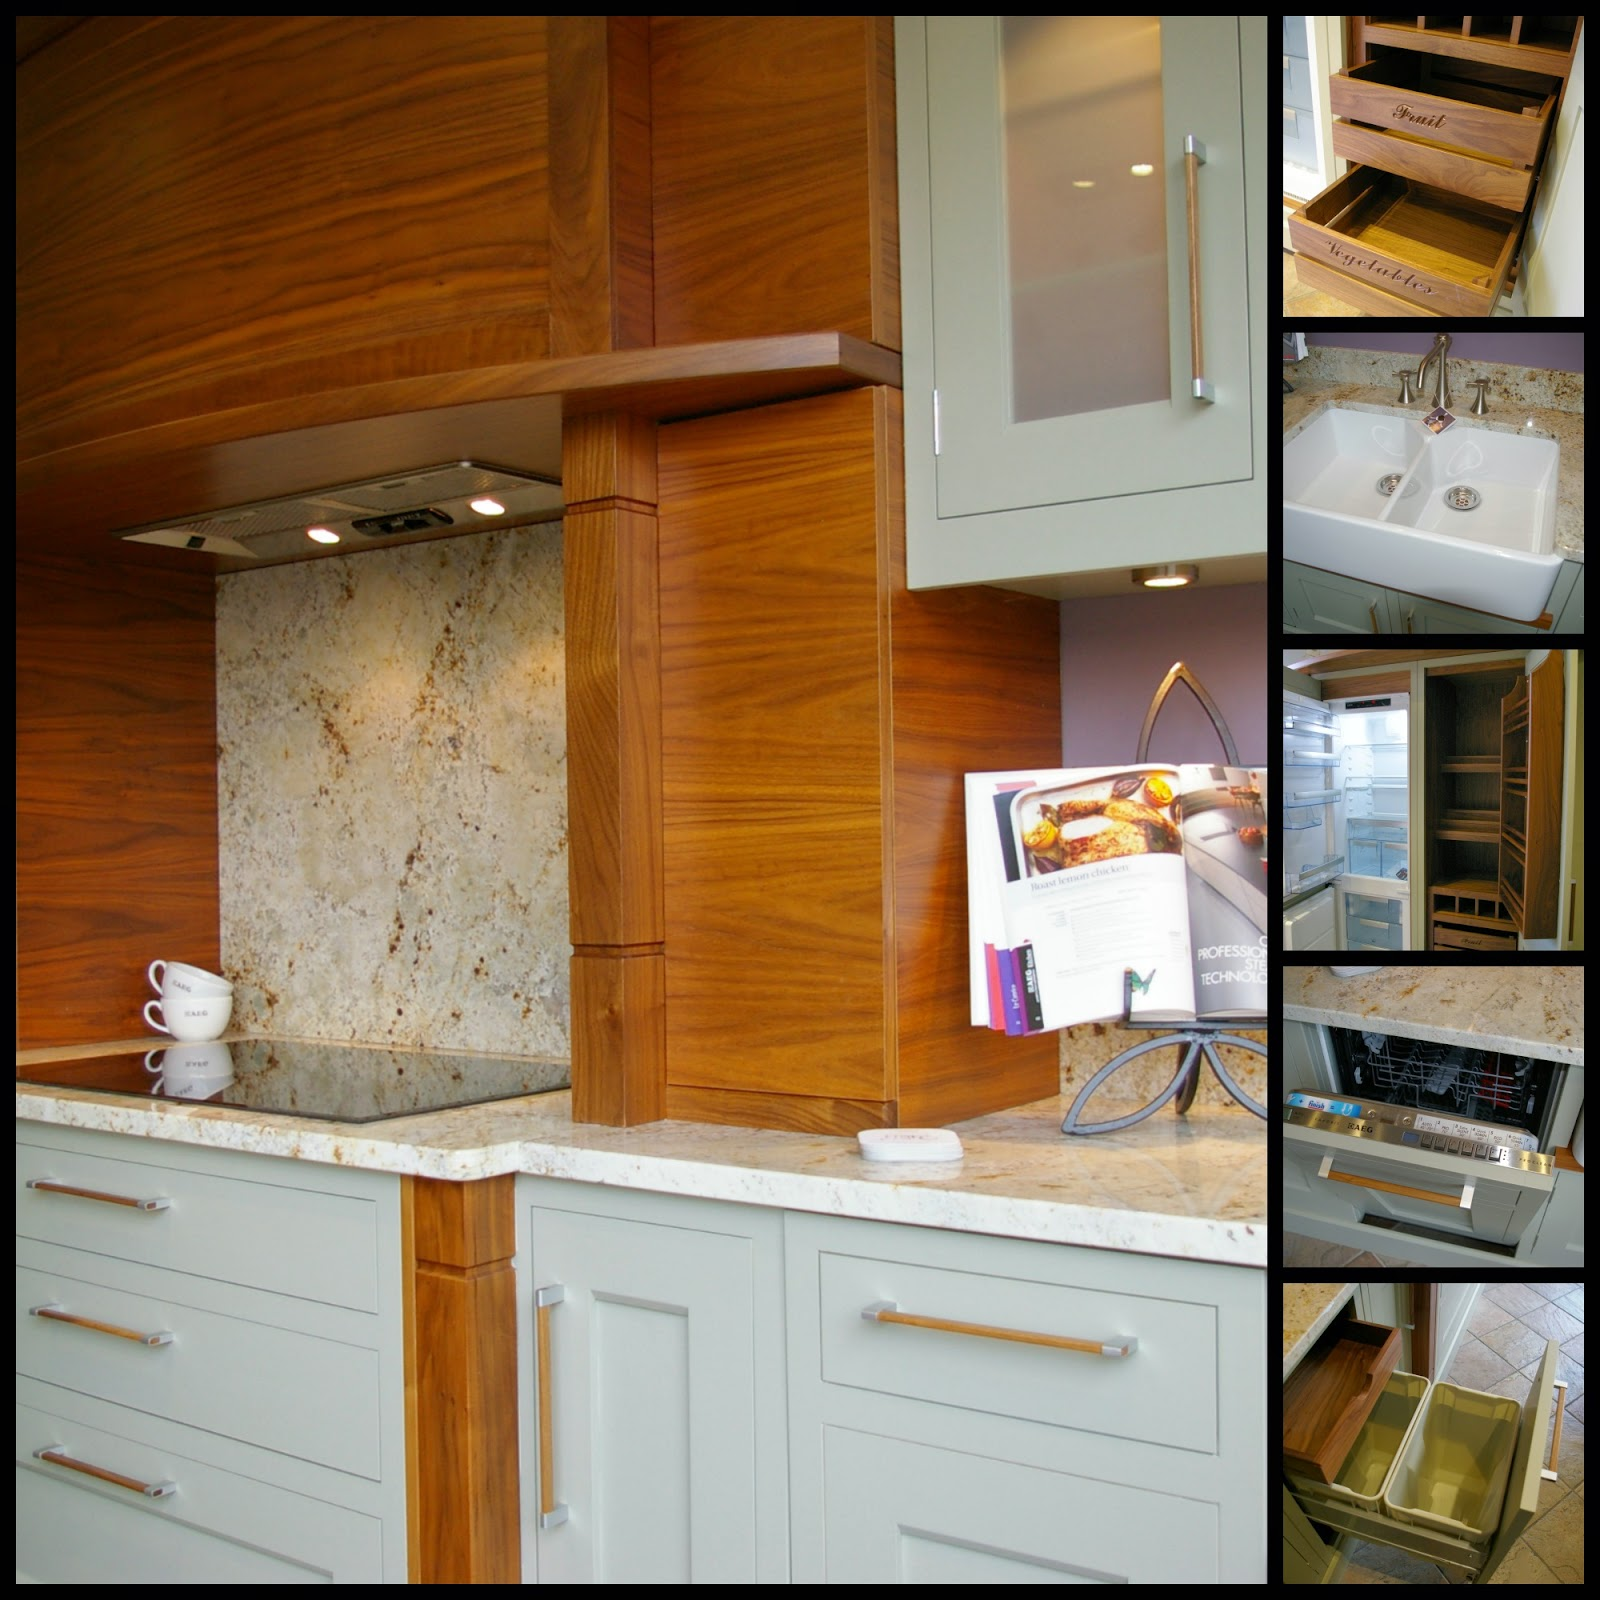 kitchen displays for sale table callum walker interiors charles yorke framed porto ex